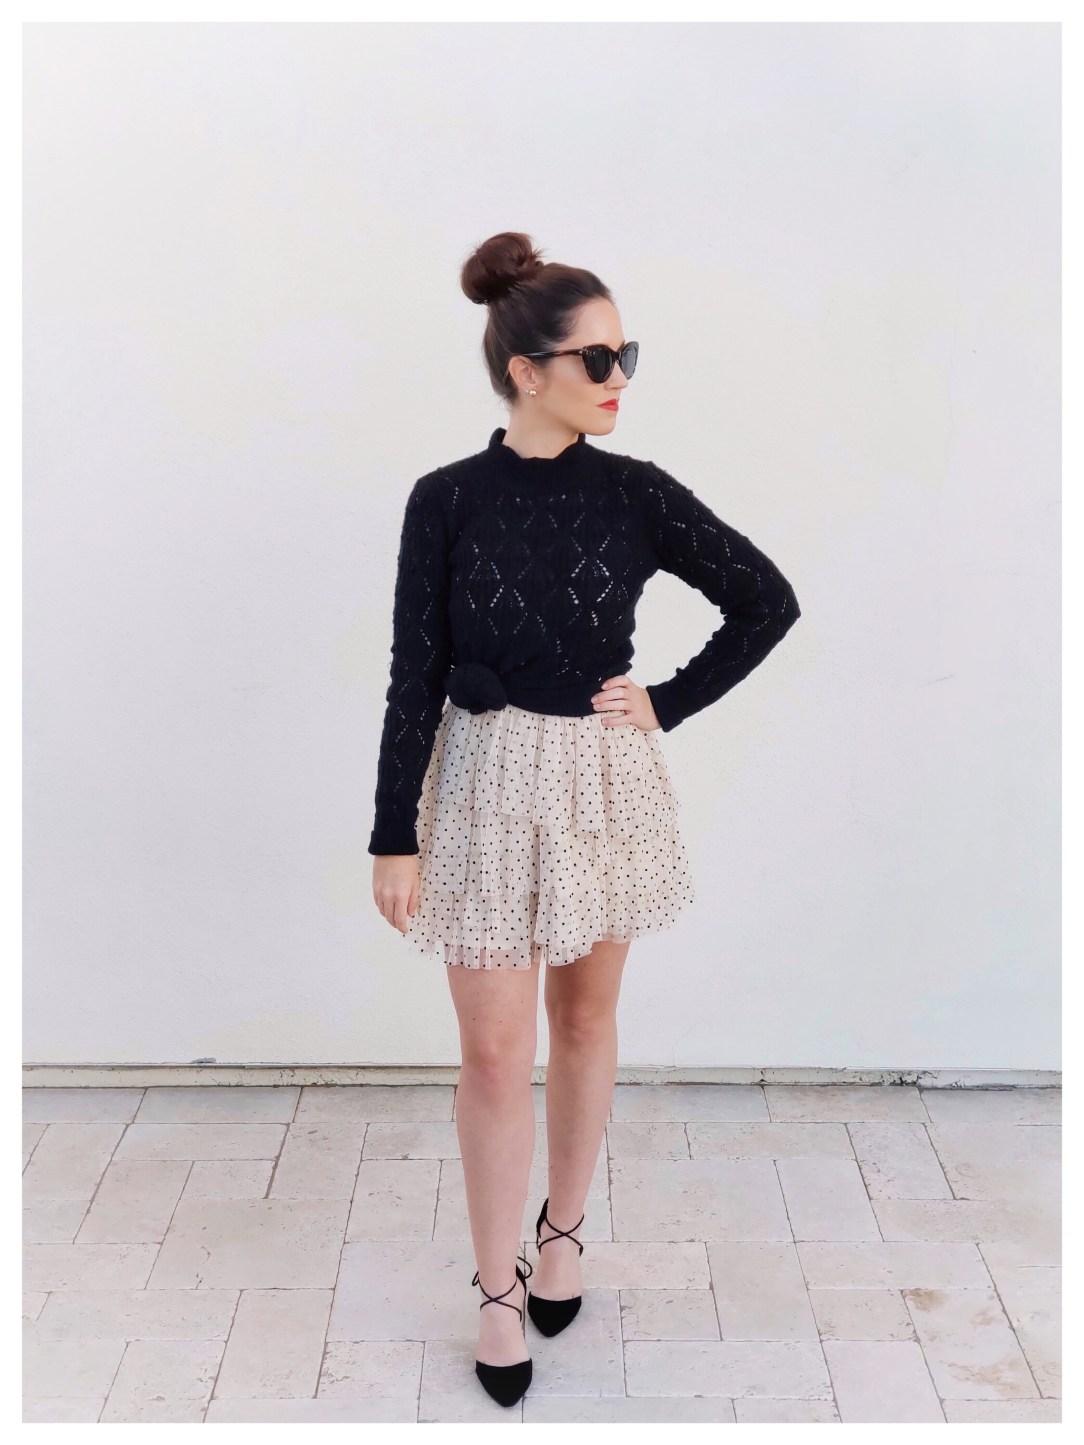 Petite Fashion Blogger Five Foot Feminine in Abercrombie TIERED DOT DRESS